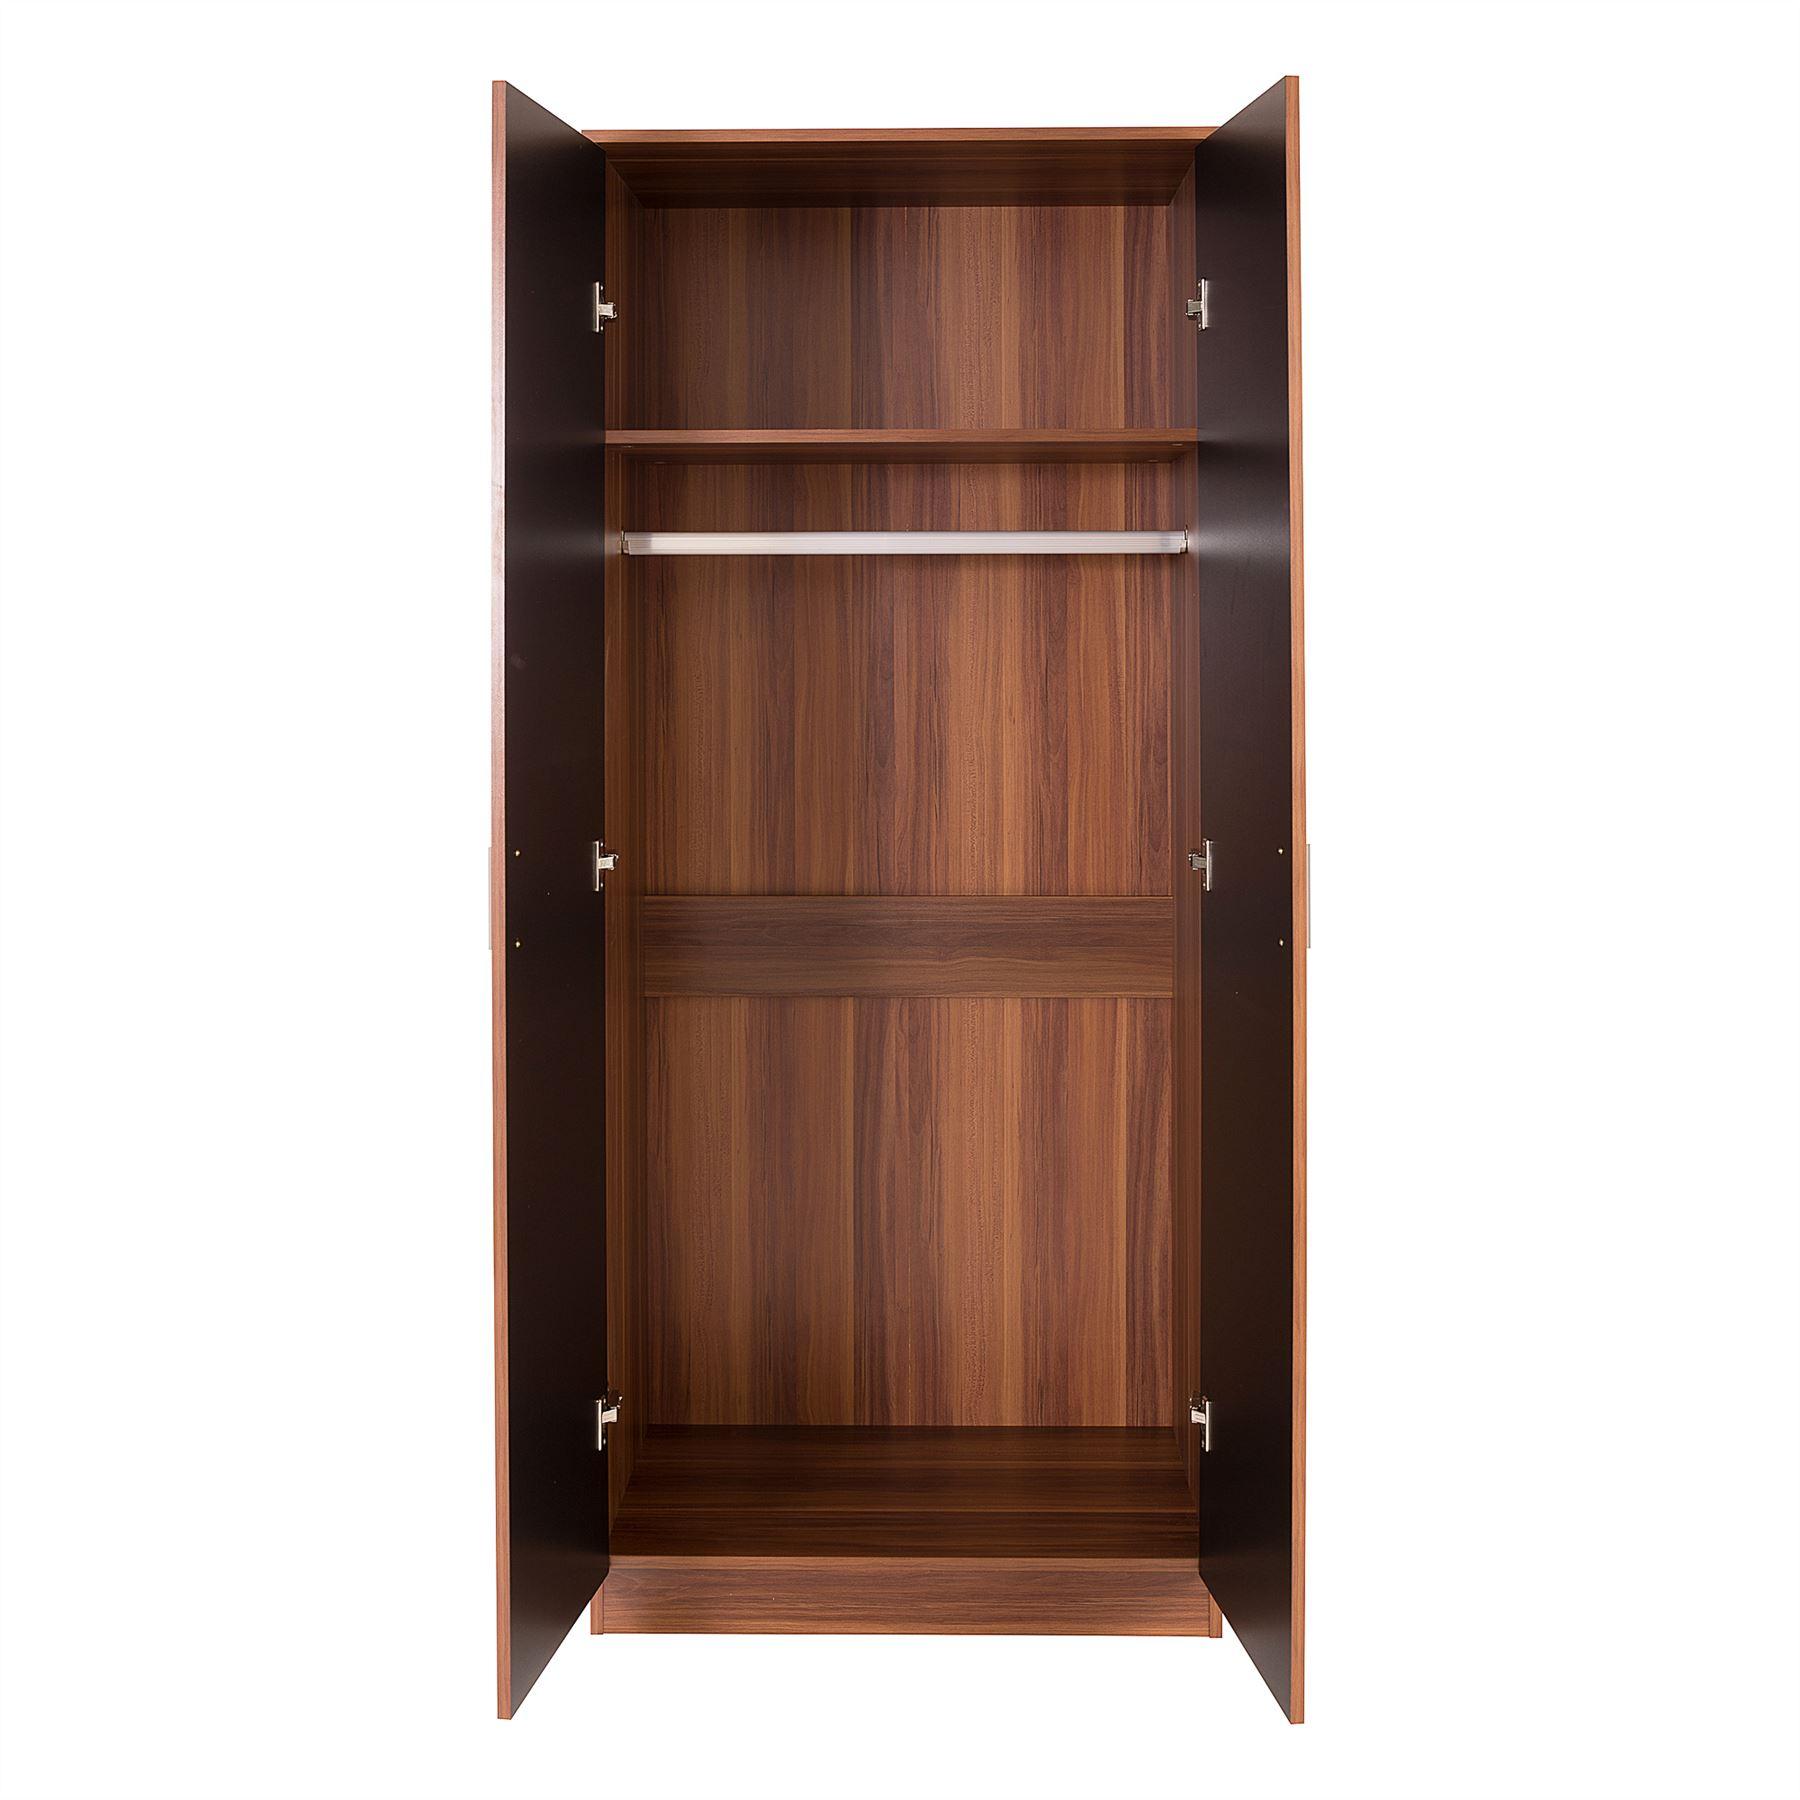 Bedroom Furniture 3 Piece Set Black Gloss Walnut Wardrobe Bedside Drawer Chest Ebay